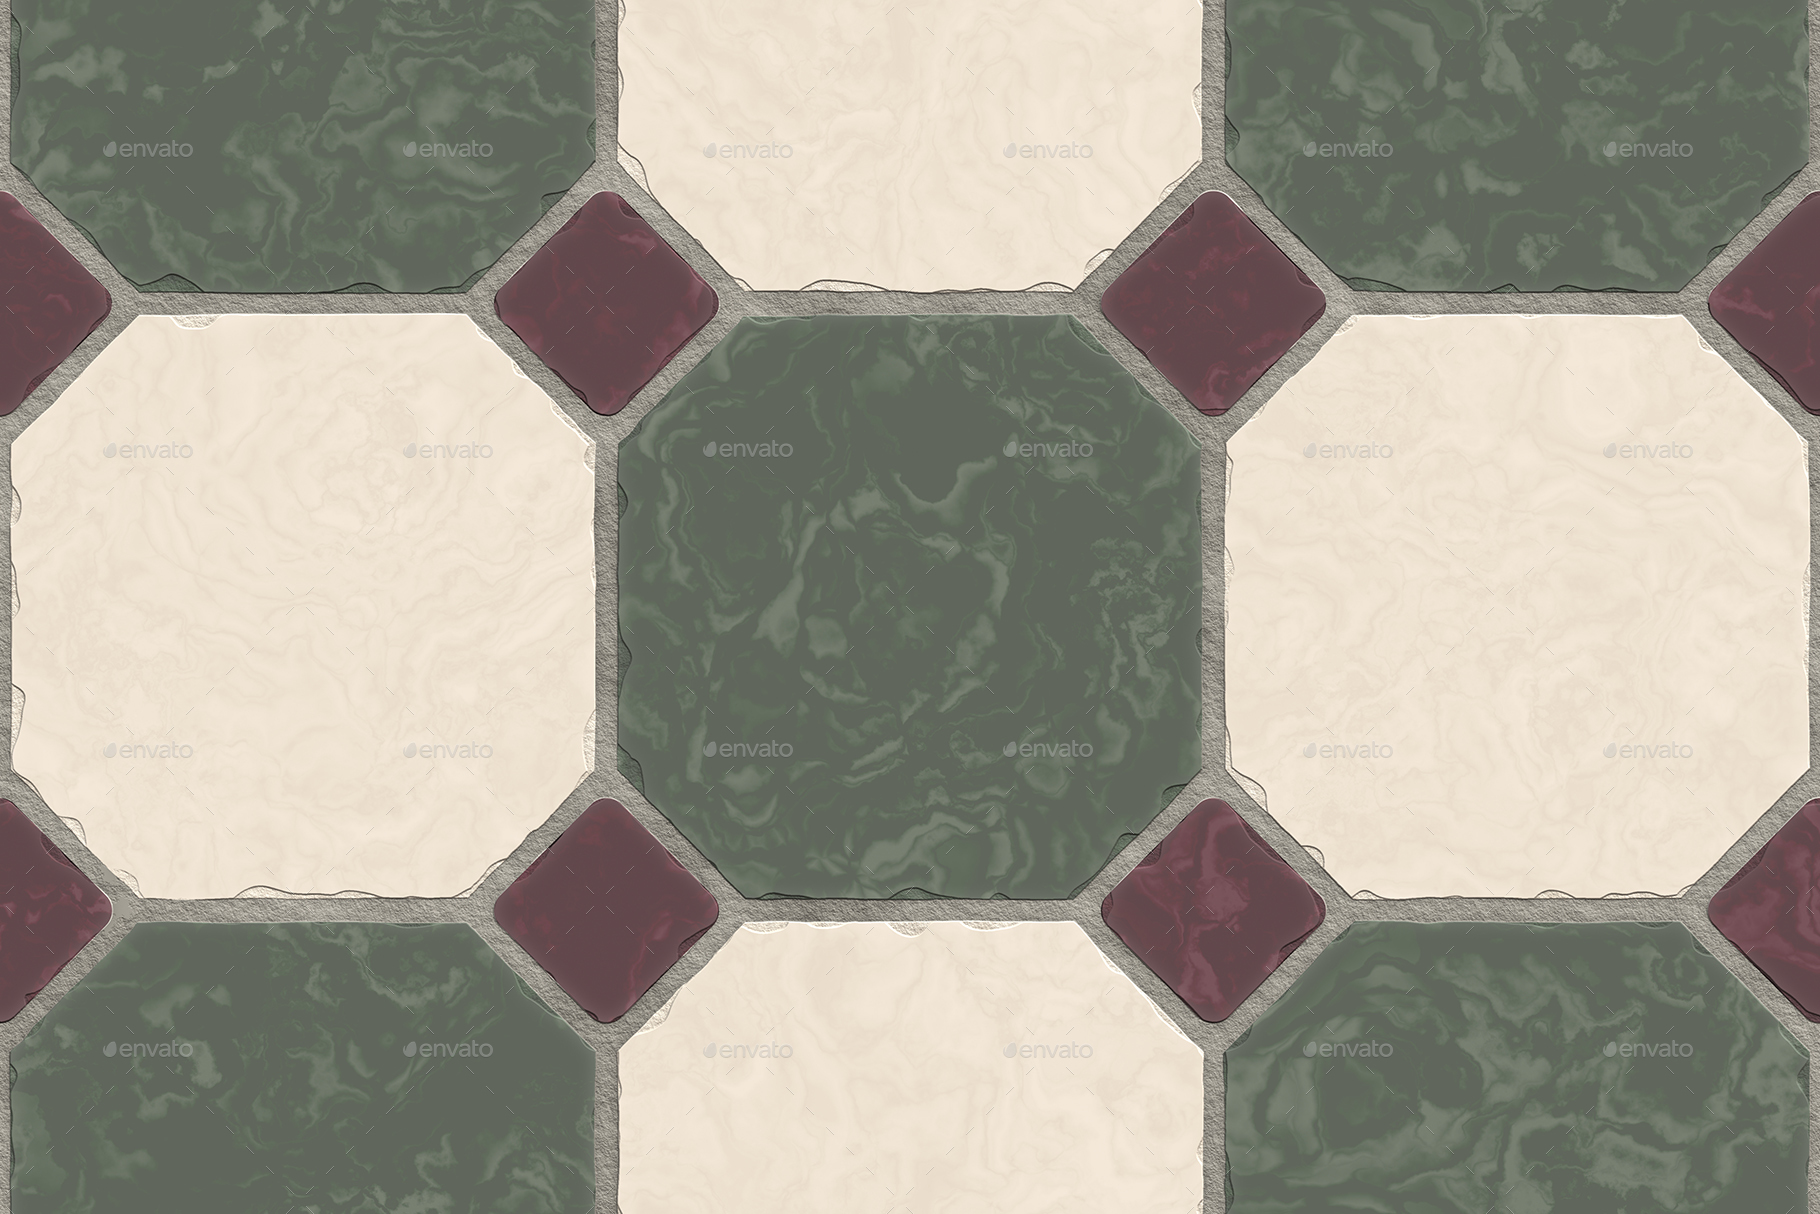 10 classic floor tile textures by webcombo 3docean 6 classic floor tile background texture copyg dailygadgetfo Images